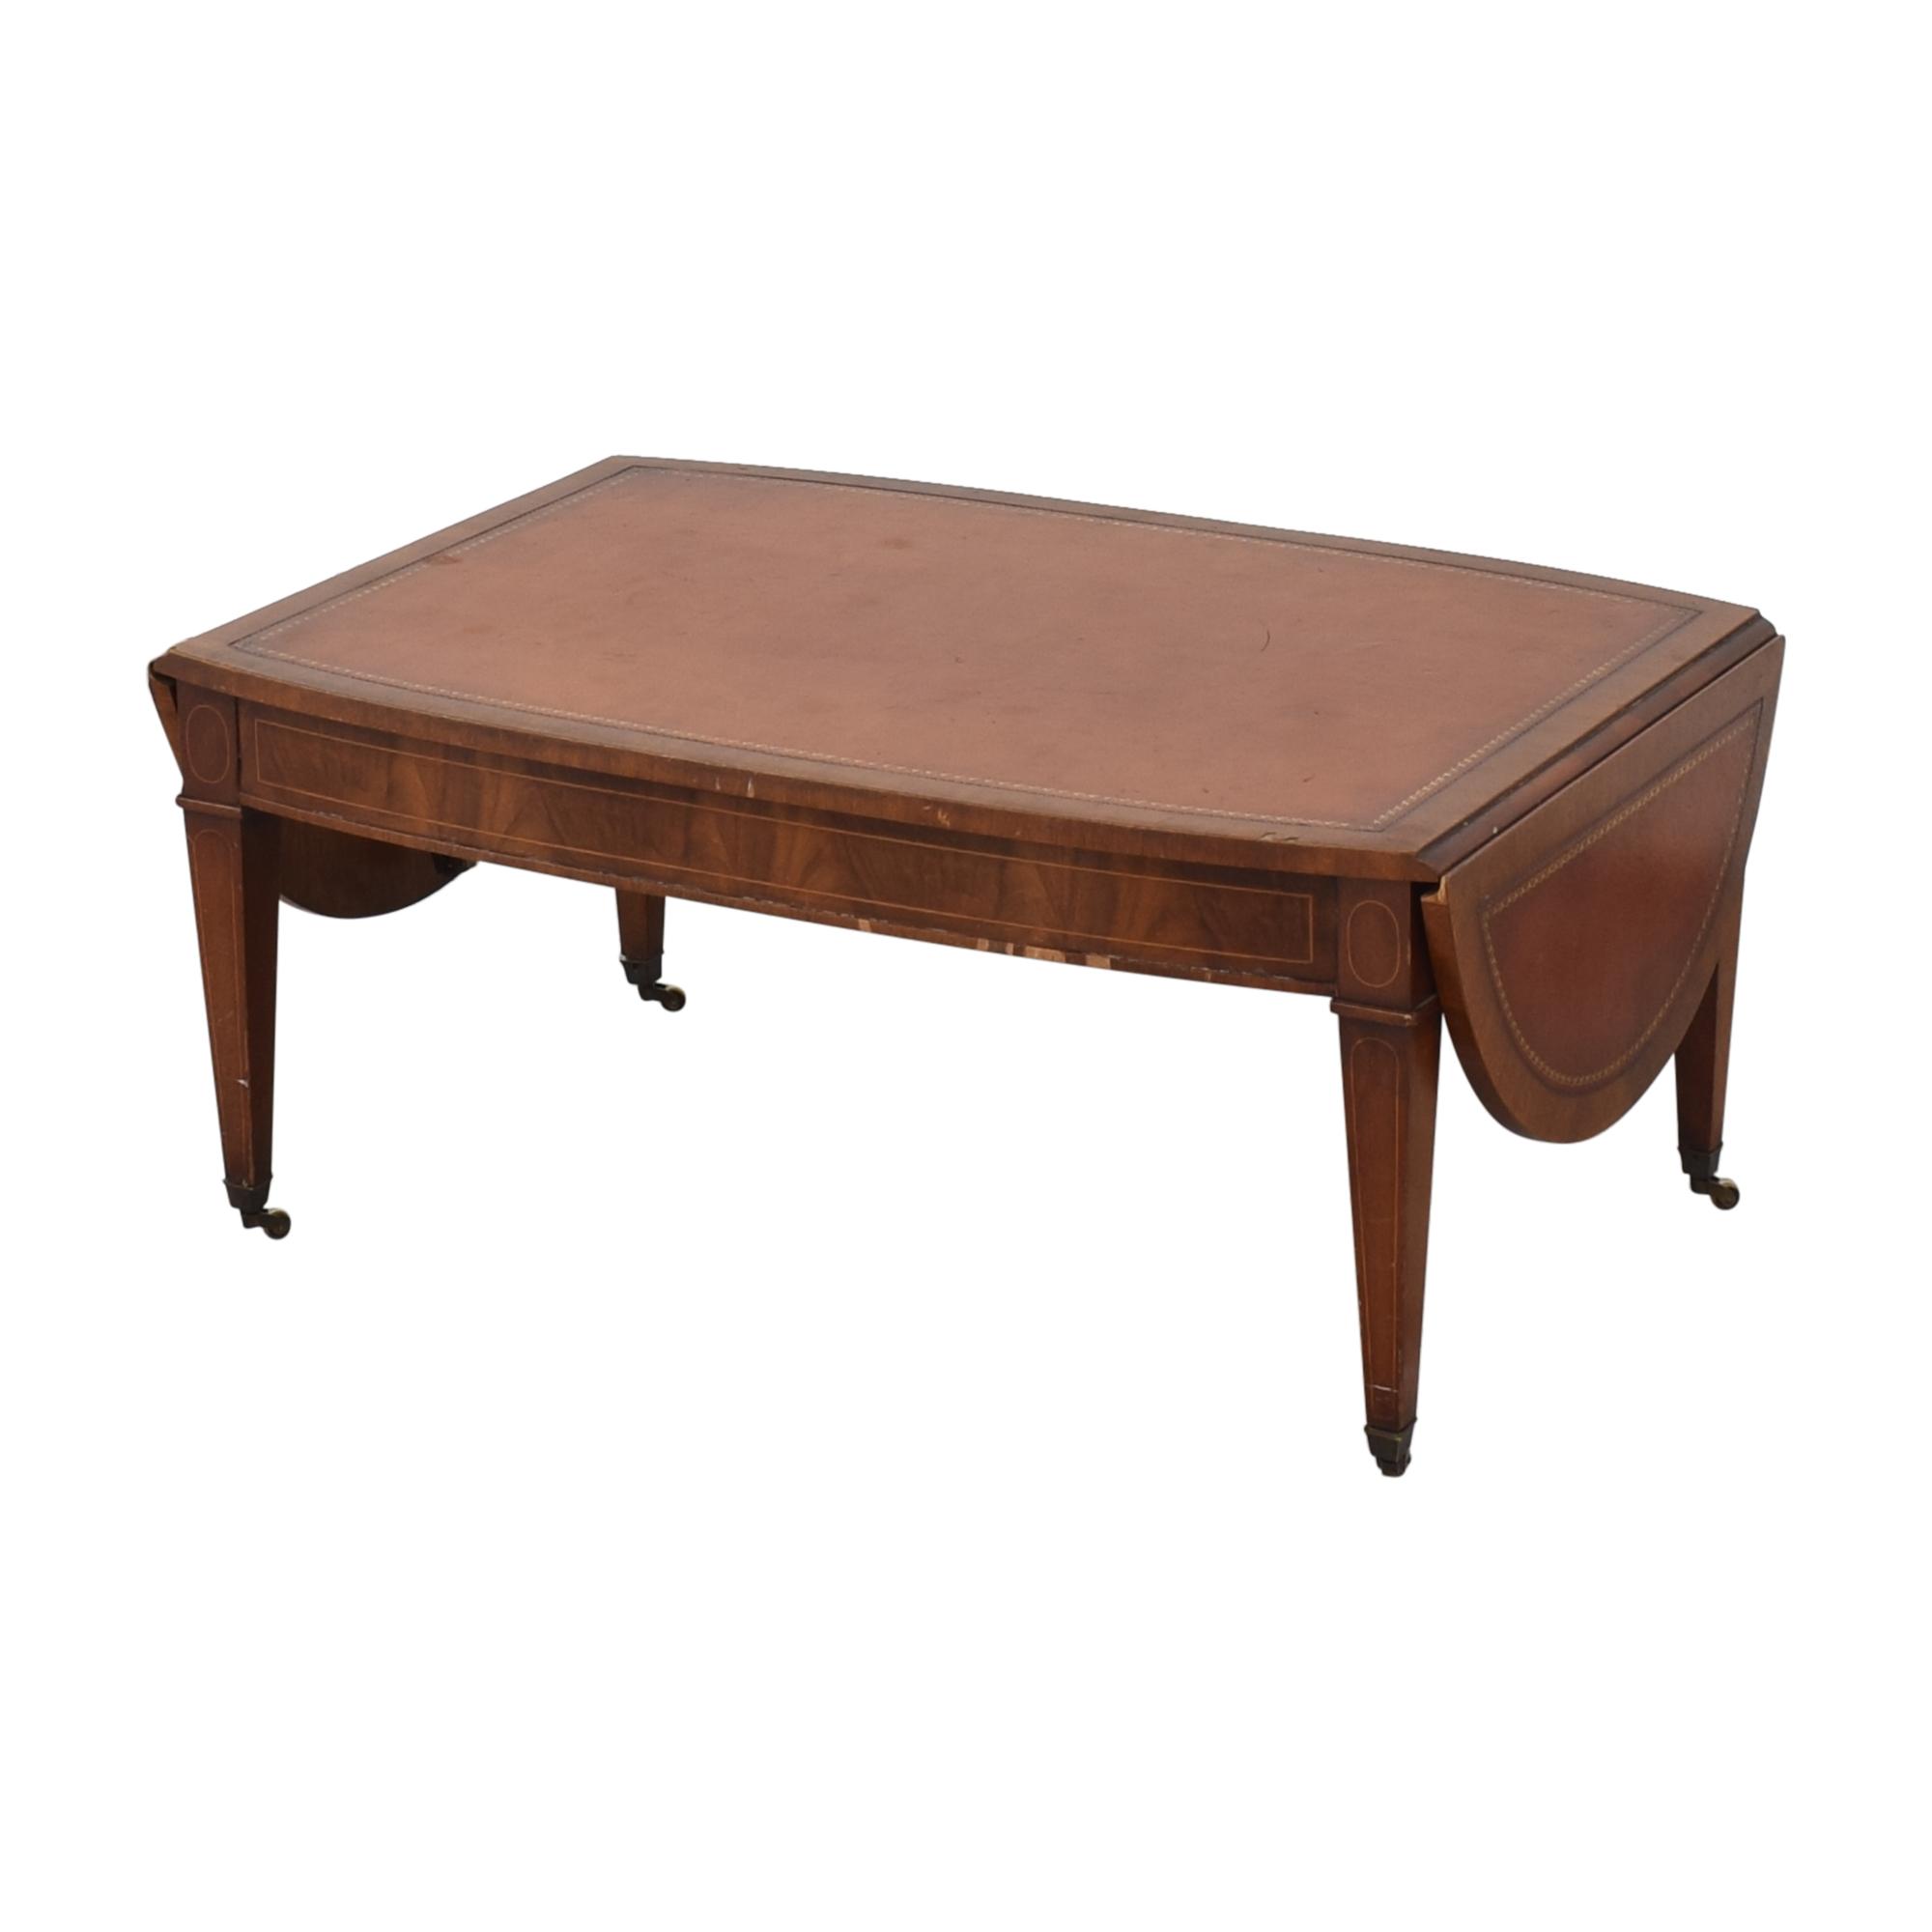 Henredon Furniture Henredon Side Extension Coffee Table brown